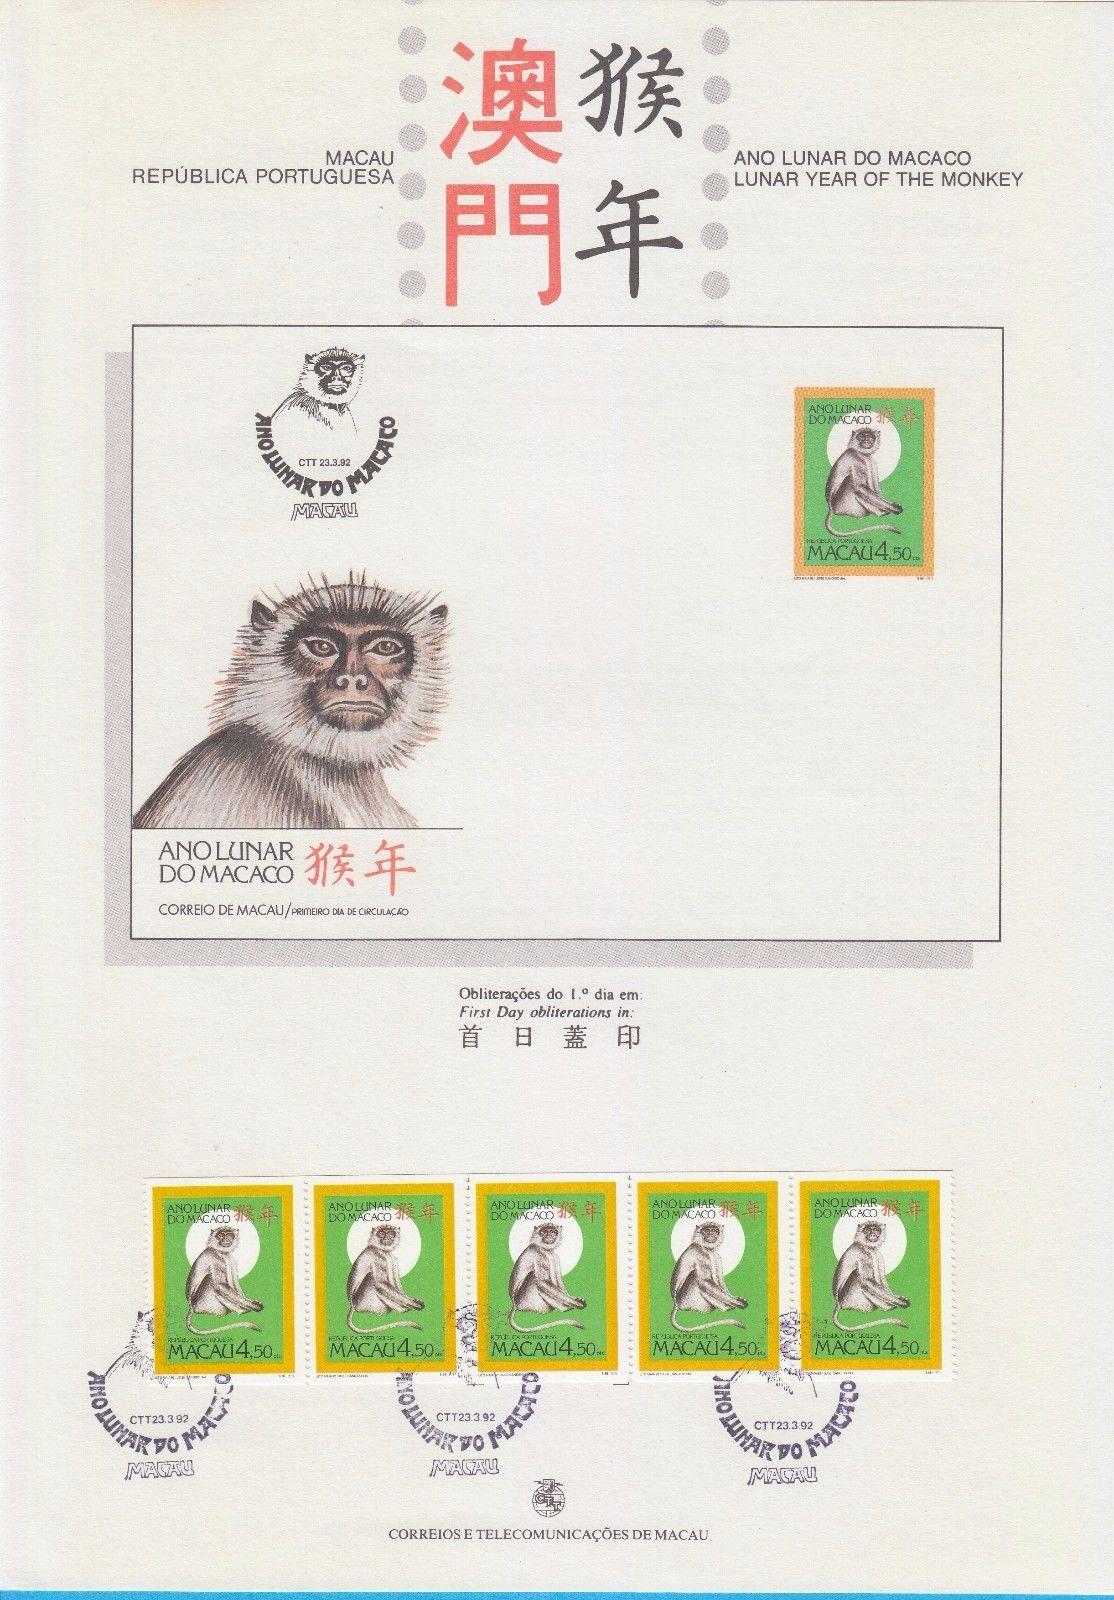 Macao 1992 Year of the Monkey IOPb.jpg